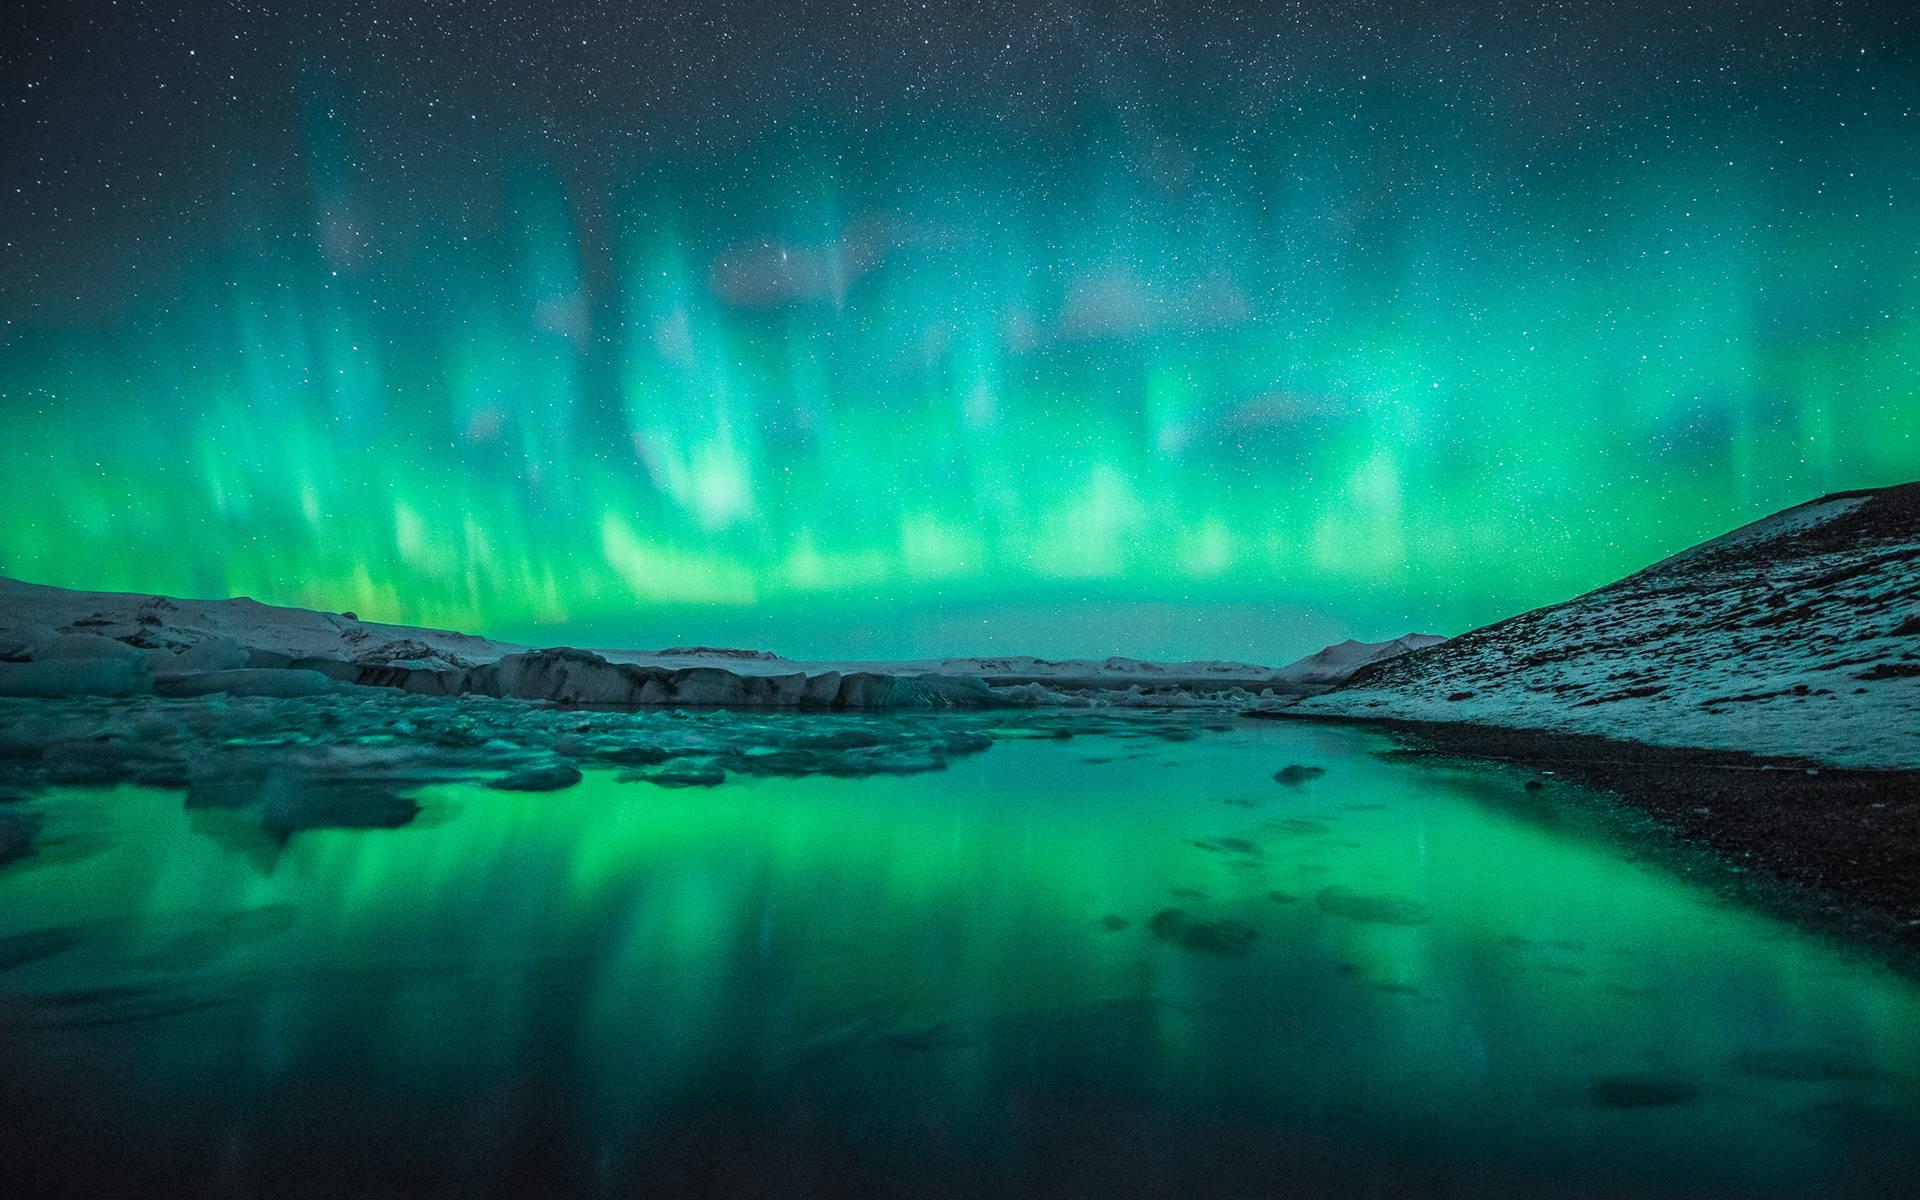 Aurora Borealis Wallpapers HD 1920x1200